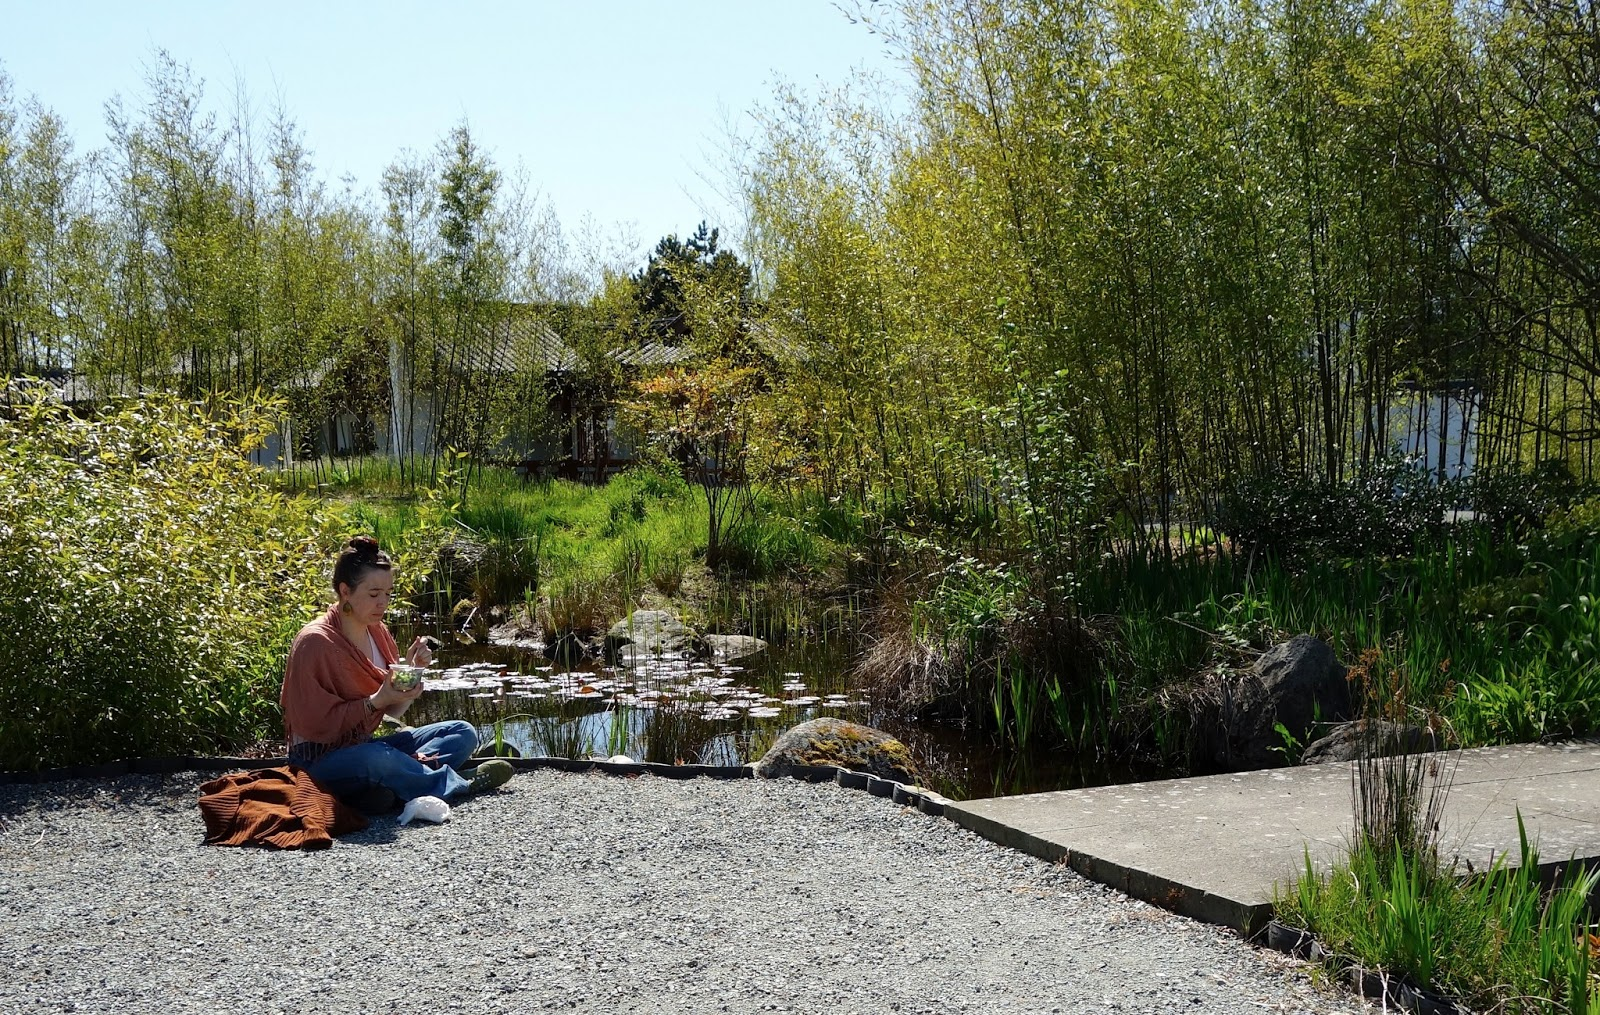 chaliese poset from seattle captures restorative energy in the garden - Seattle Chinese Garden